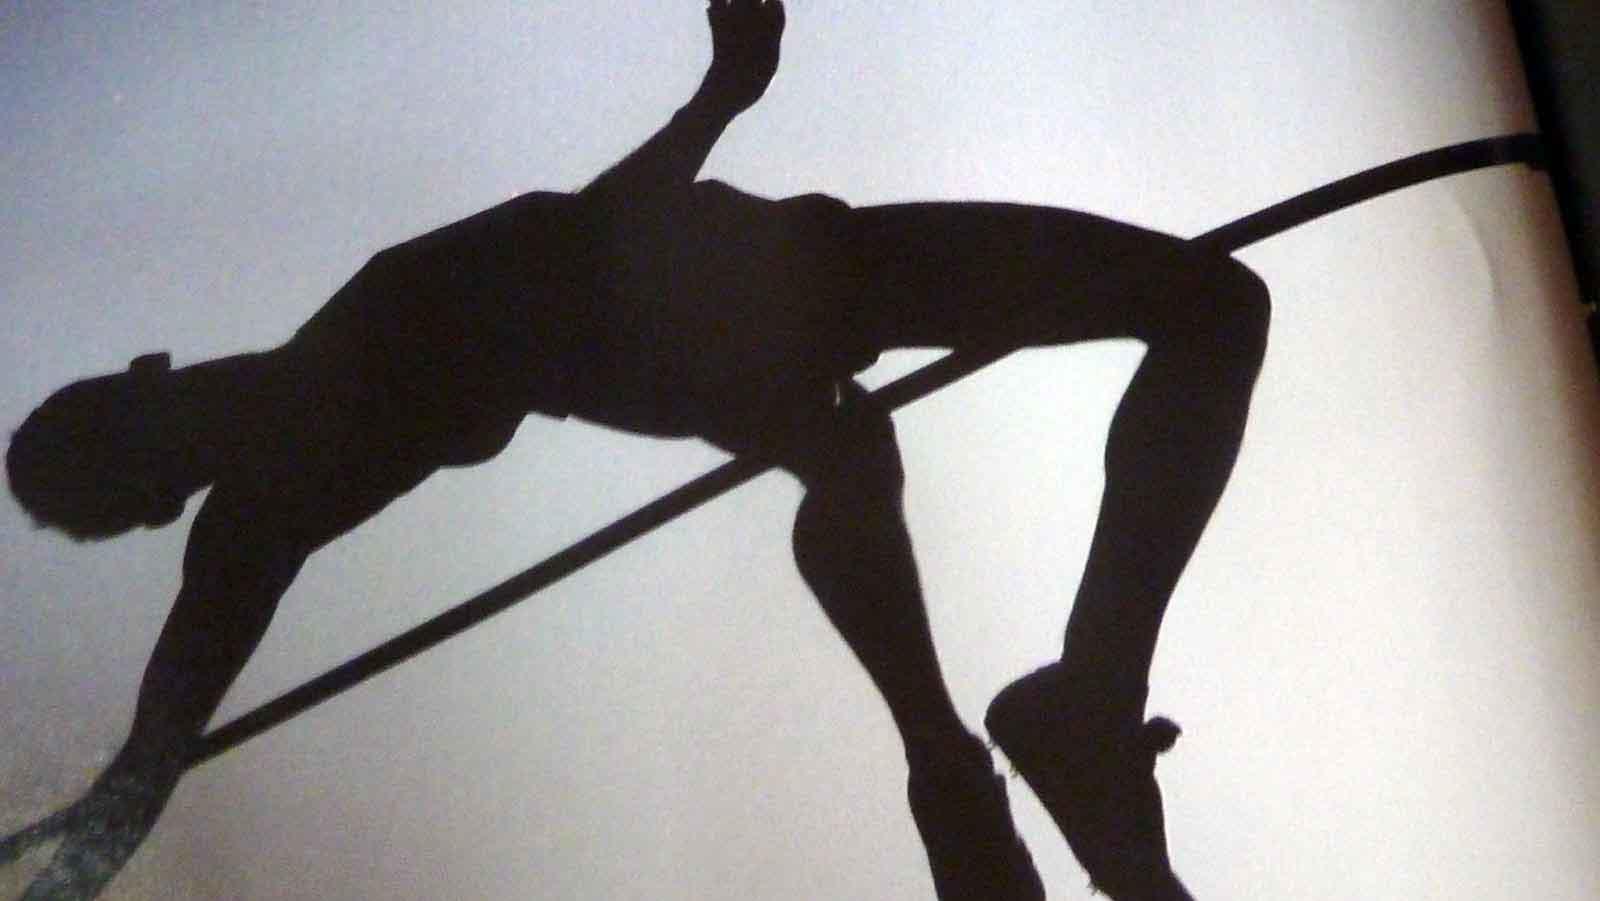 Silueta de hombre realizando salto de altura